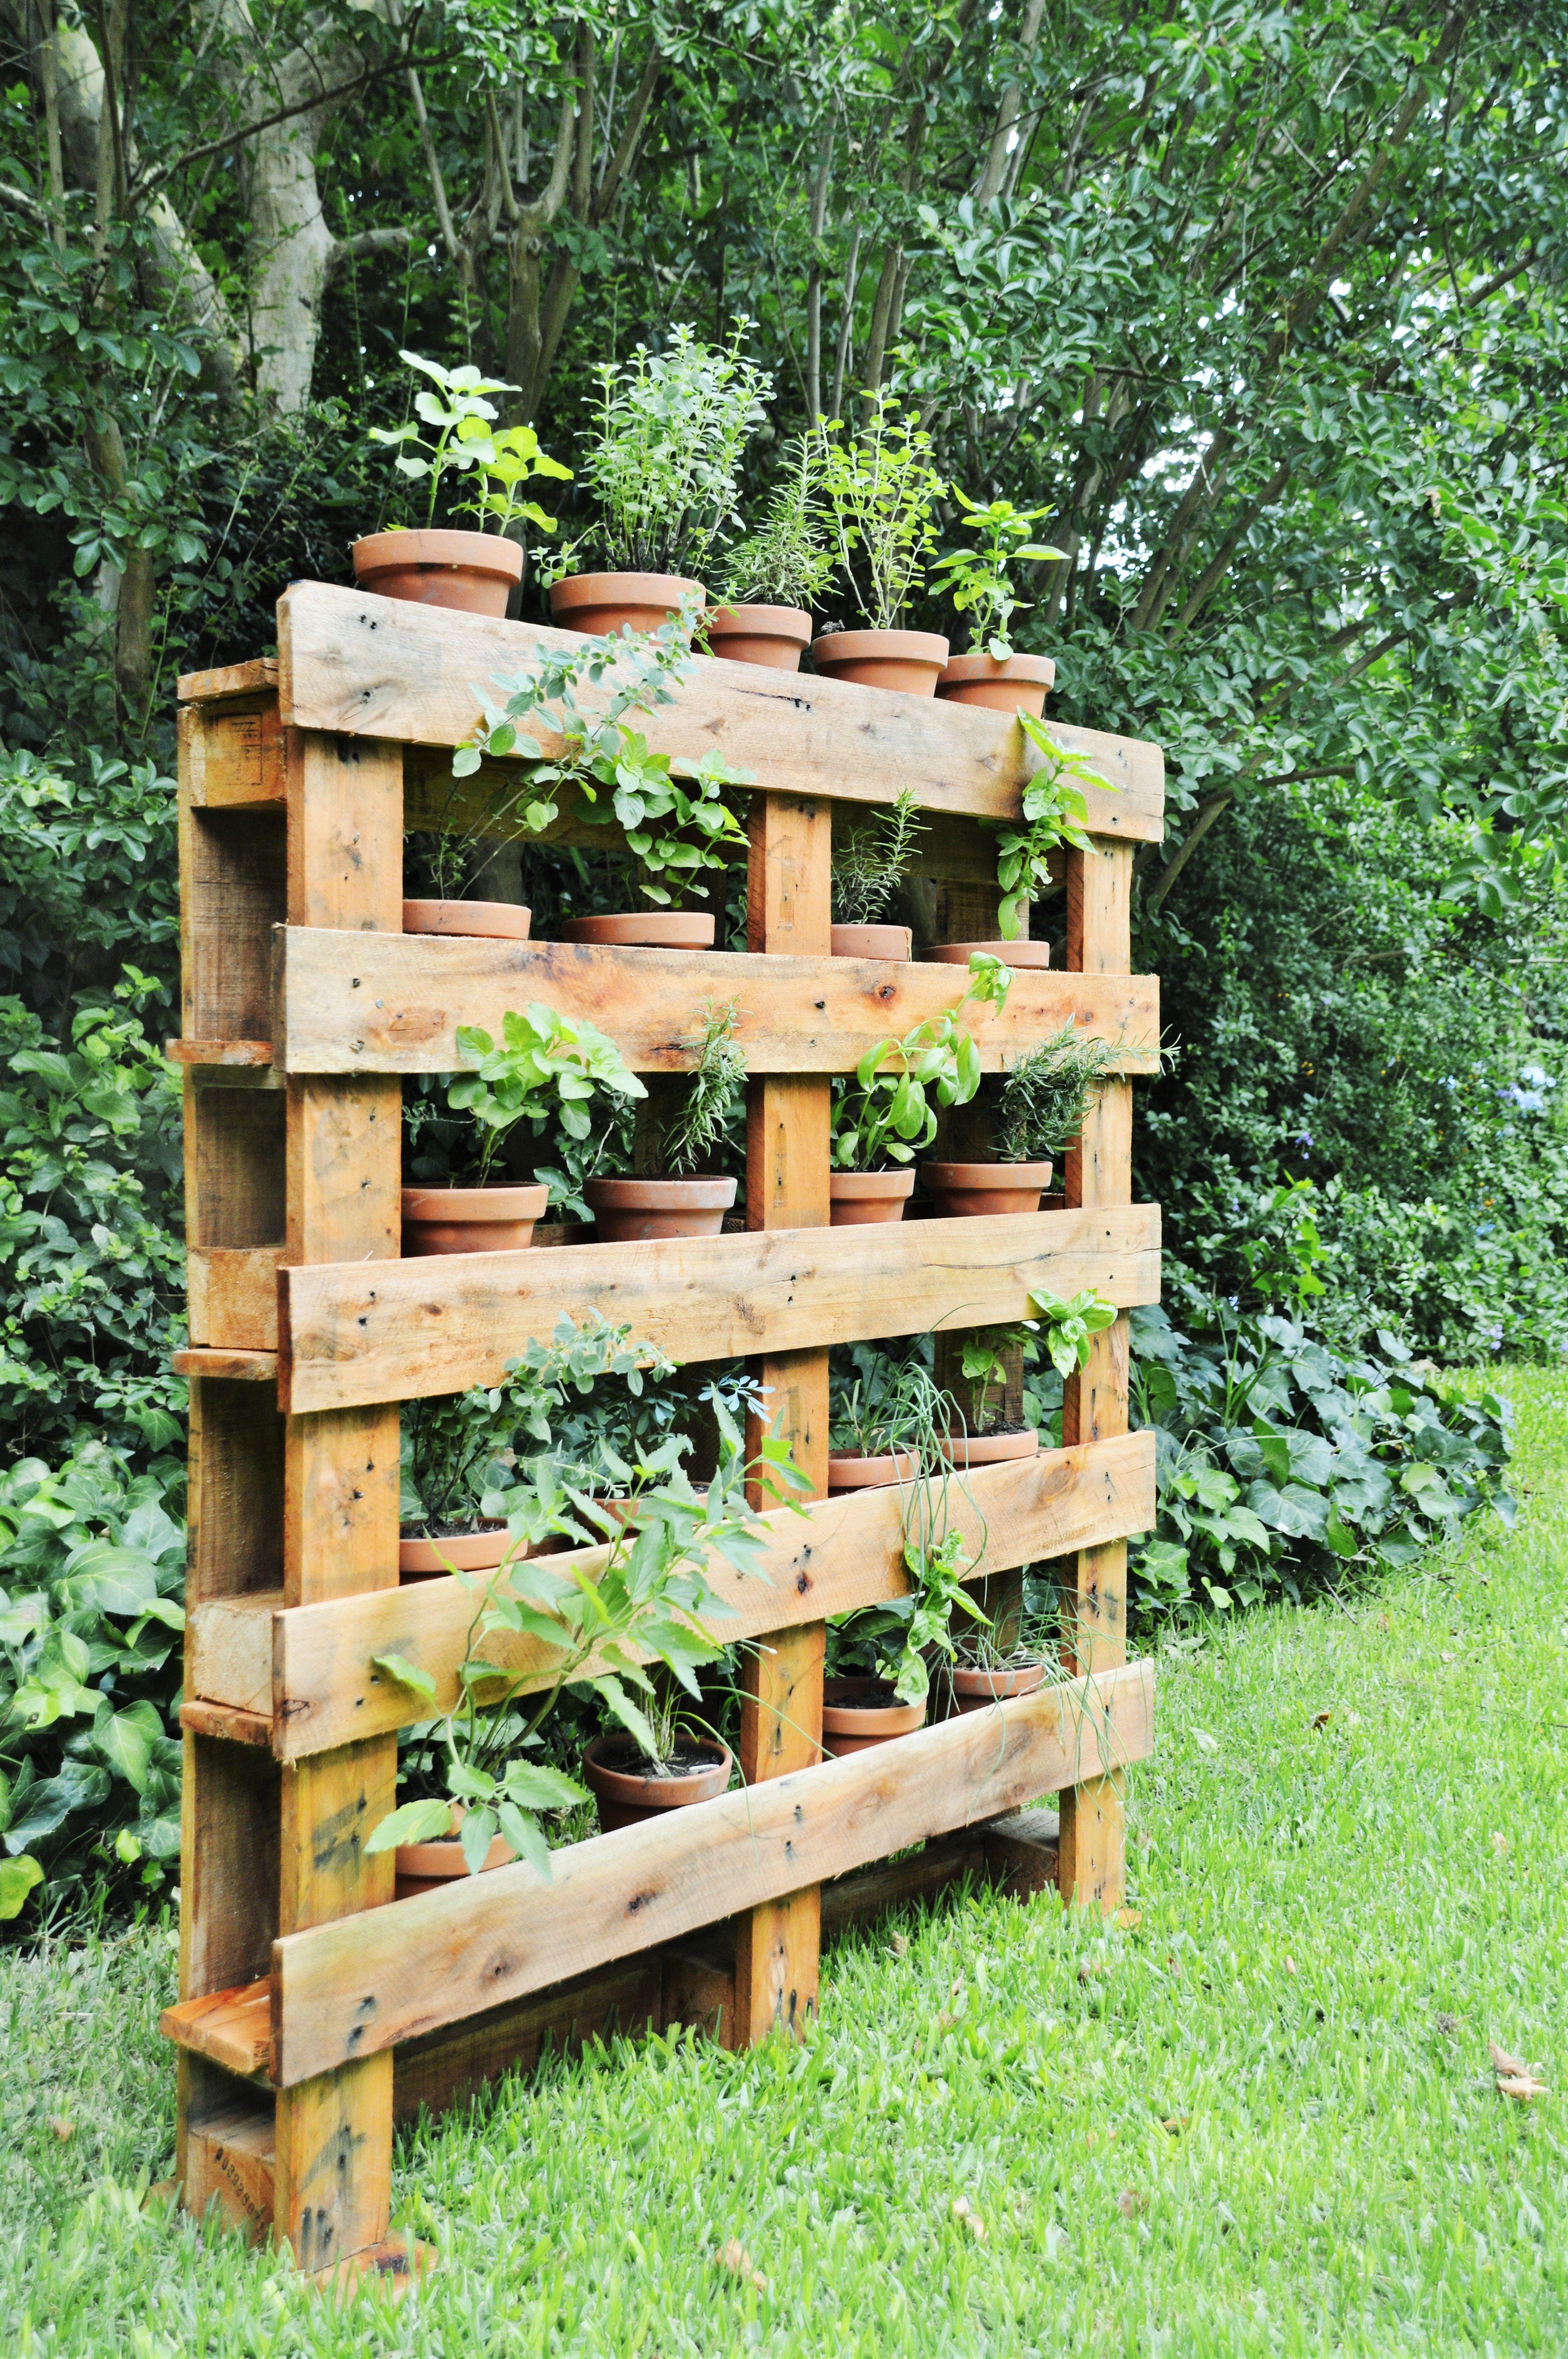 huerta vertical de especias hecha a partir de pallets